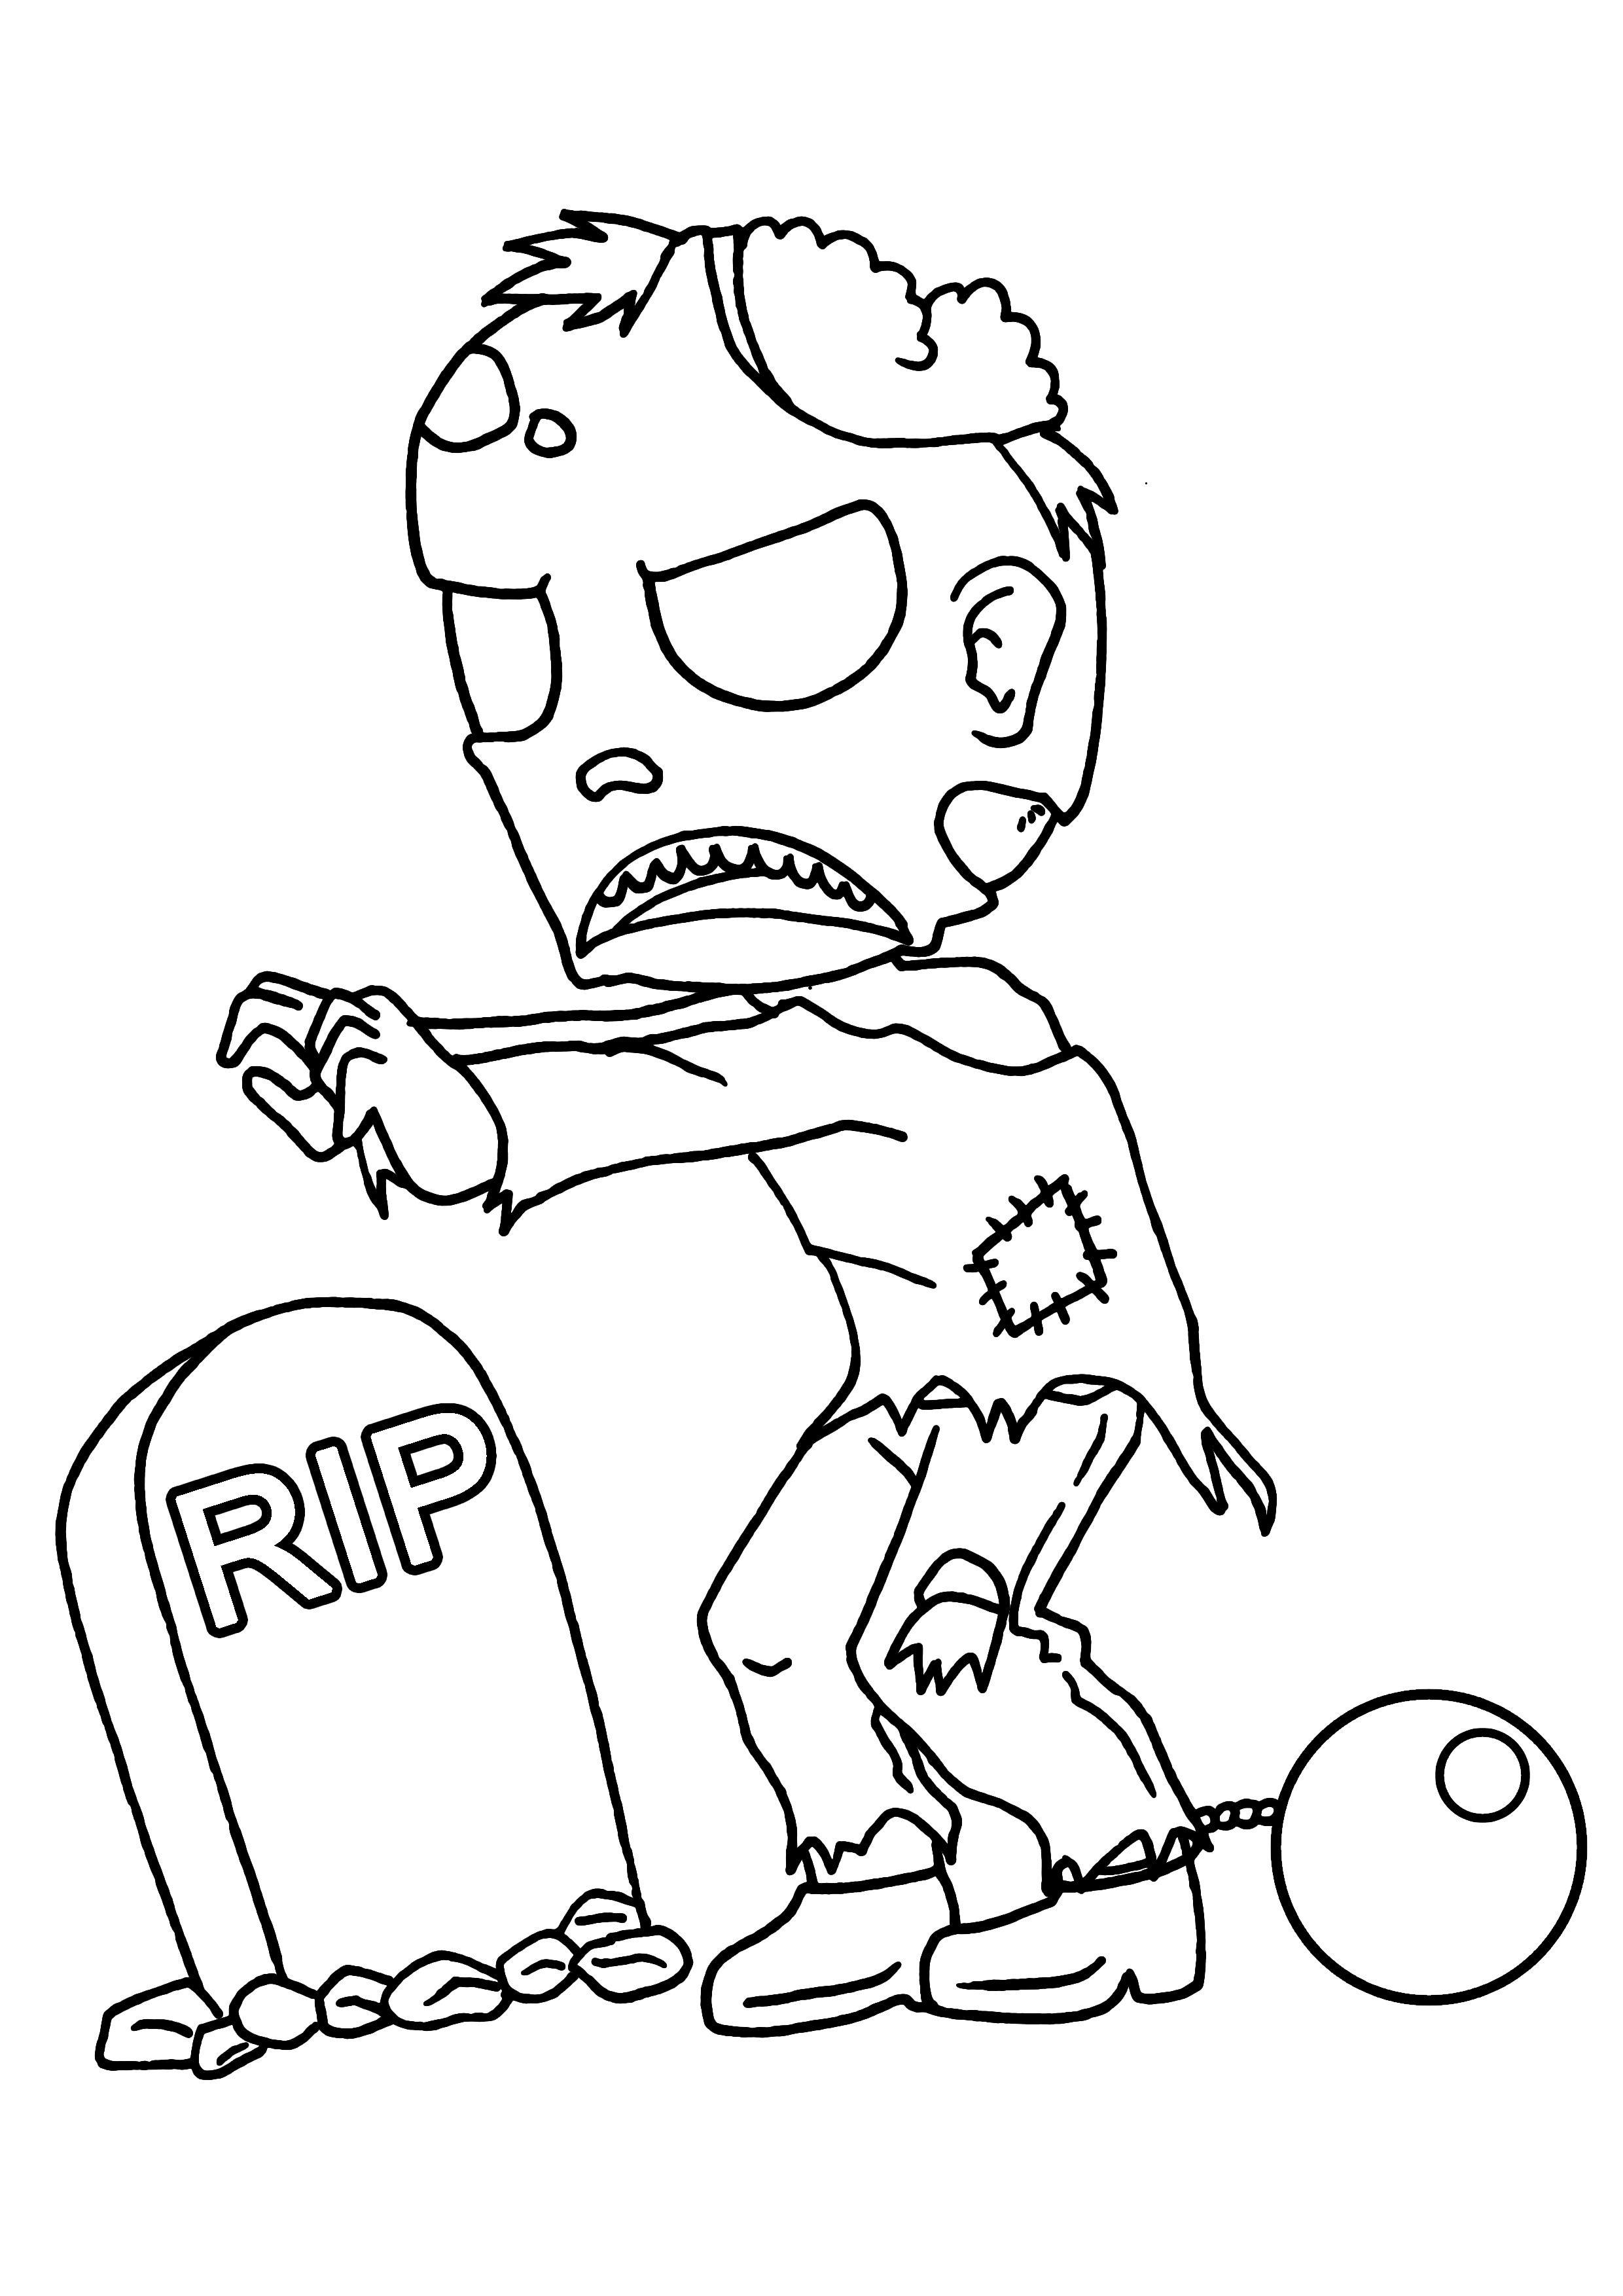 dessin a colorier pour halloween Simple, Character